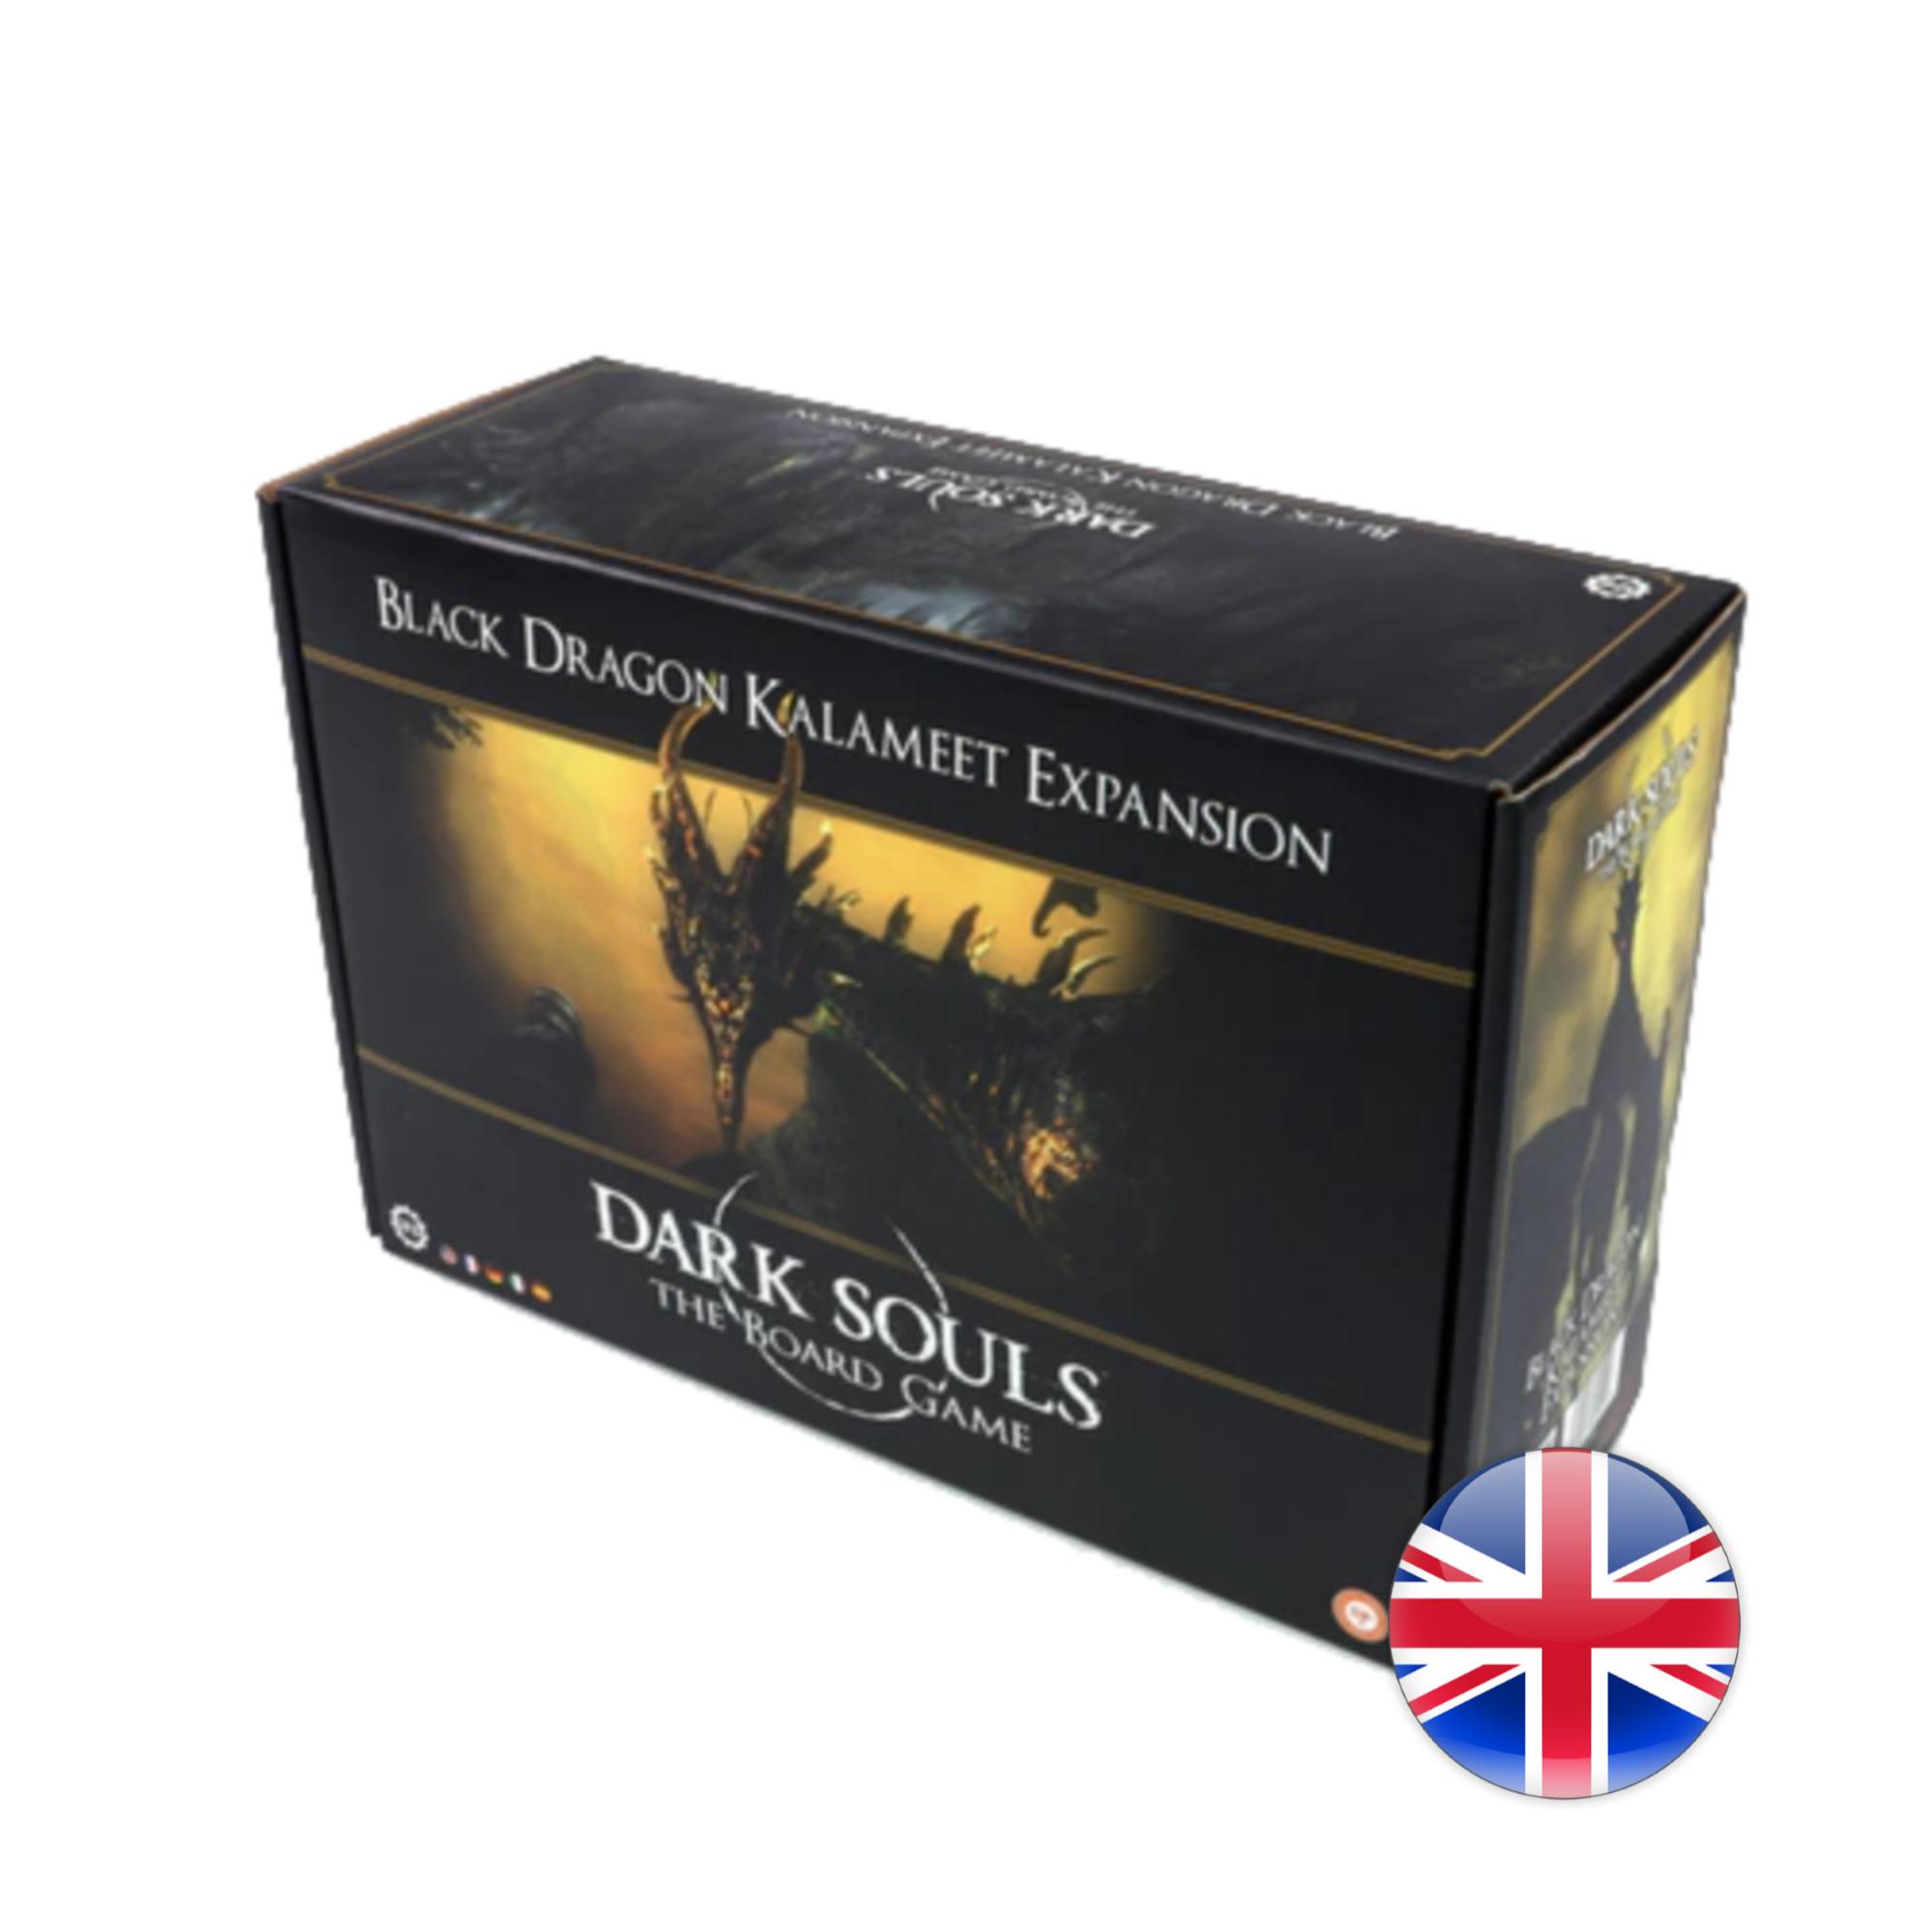 Dark Souls: The Board Game - Wave 2 Black Dragon Kalameet